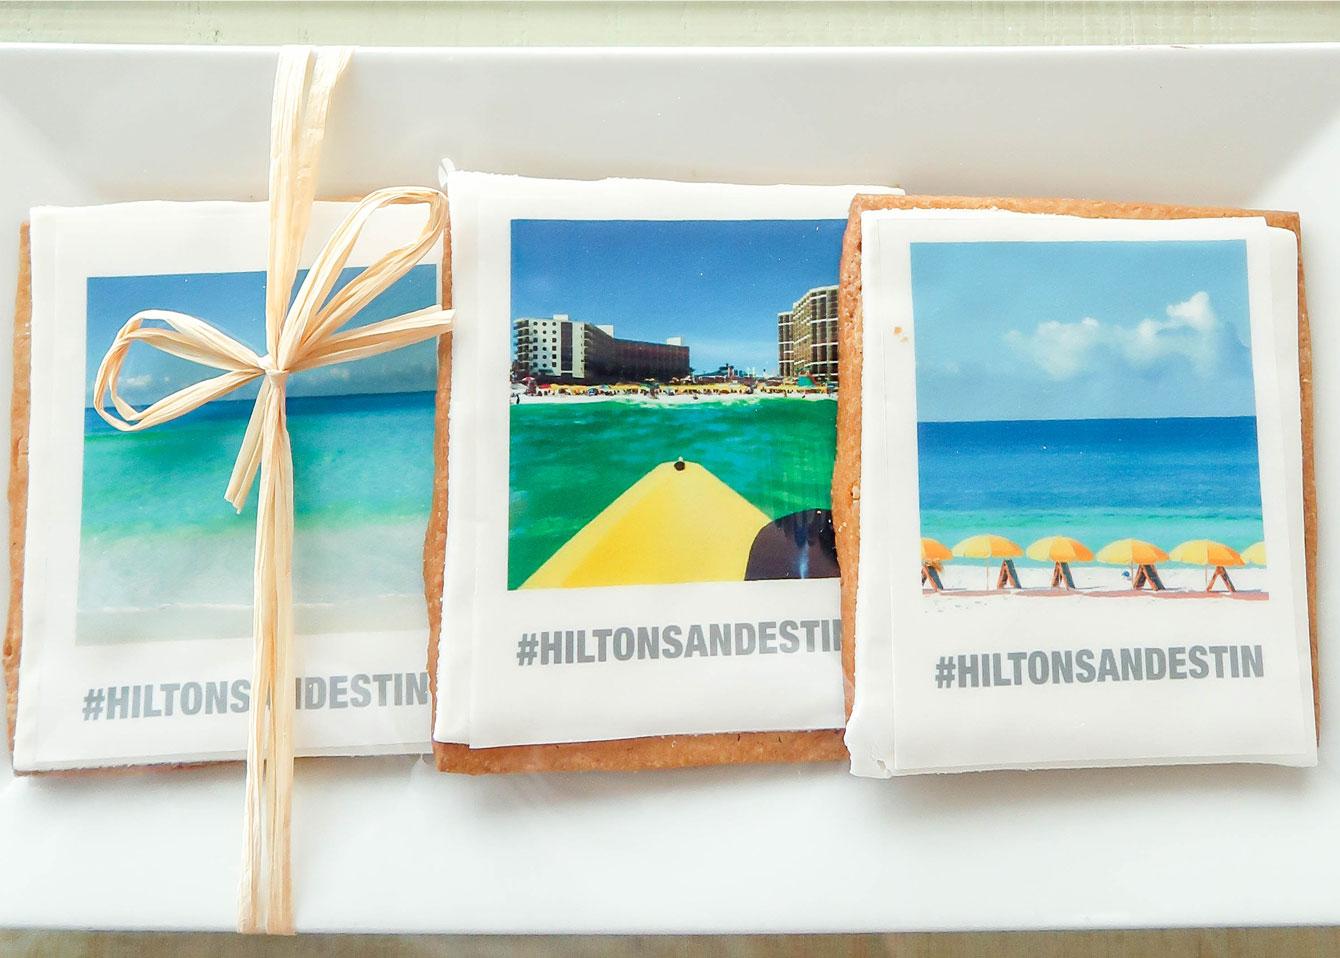 Hilton Sandestin Cookies